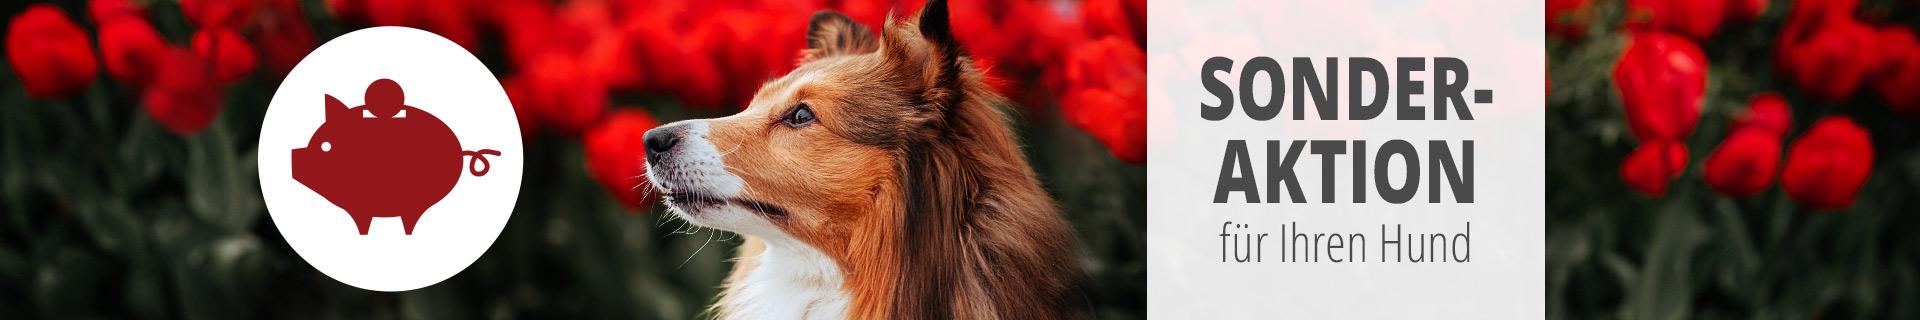 Sonderaktion Hund